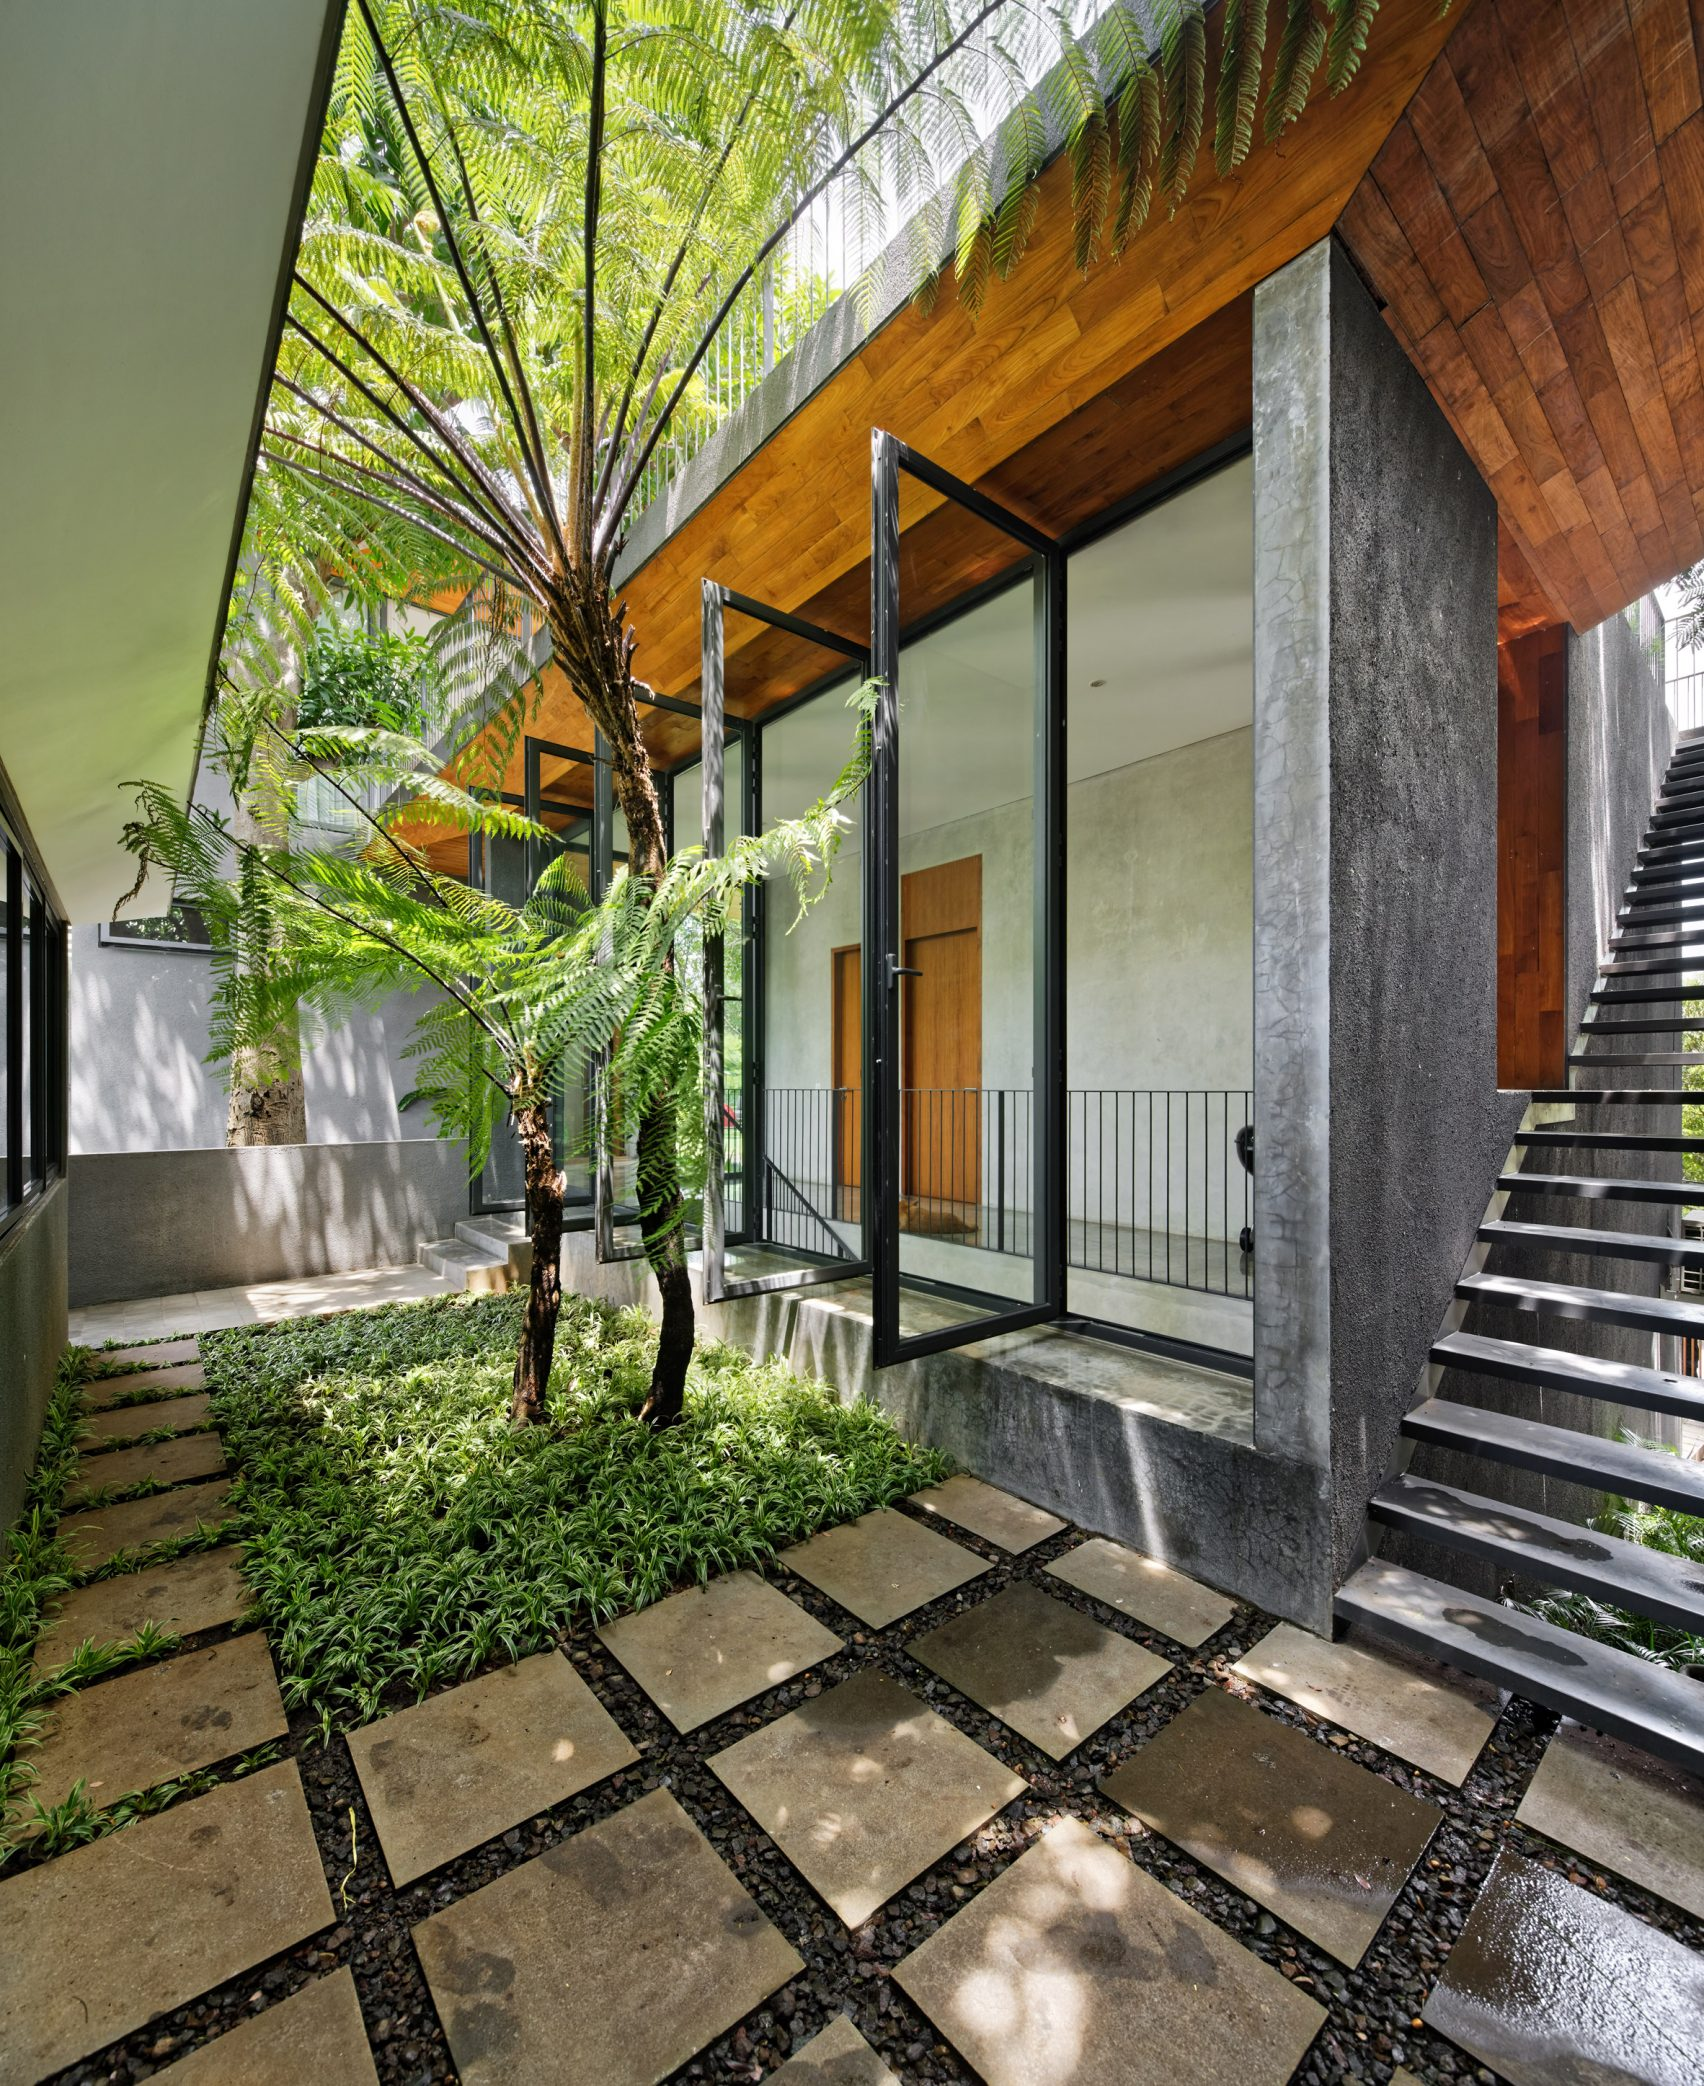 house-inside-outside-tamara-wibowo-architecture-residential-indonesia_dezeen_2364_col_12-1704x2086.jpg